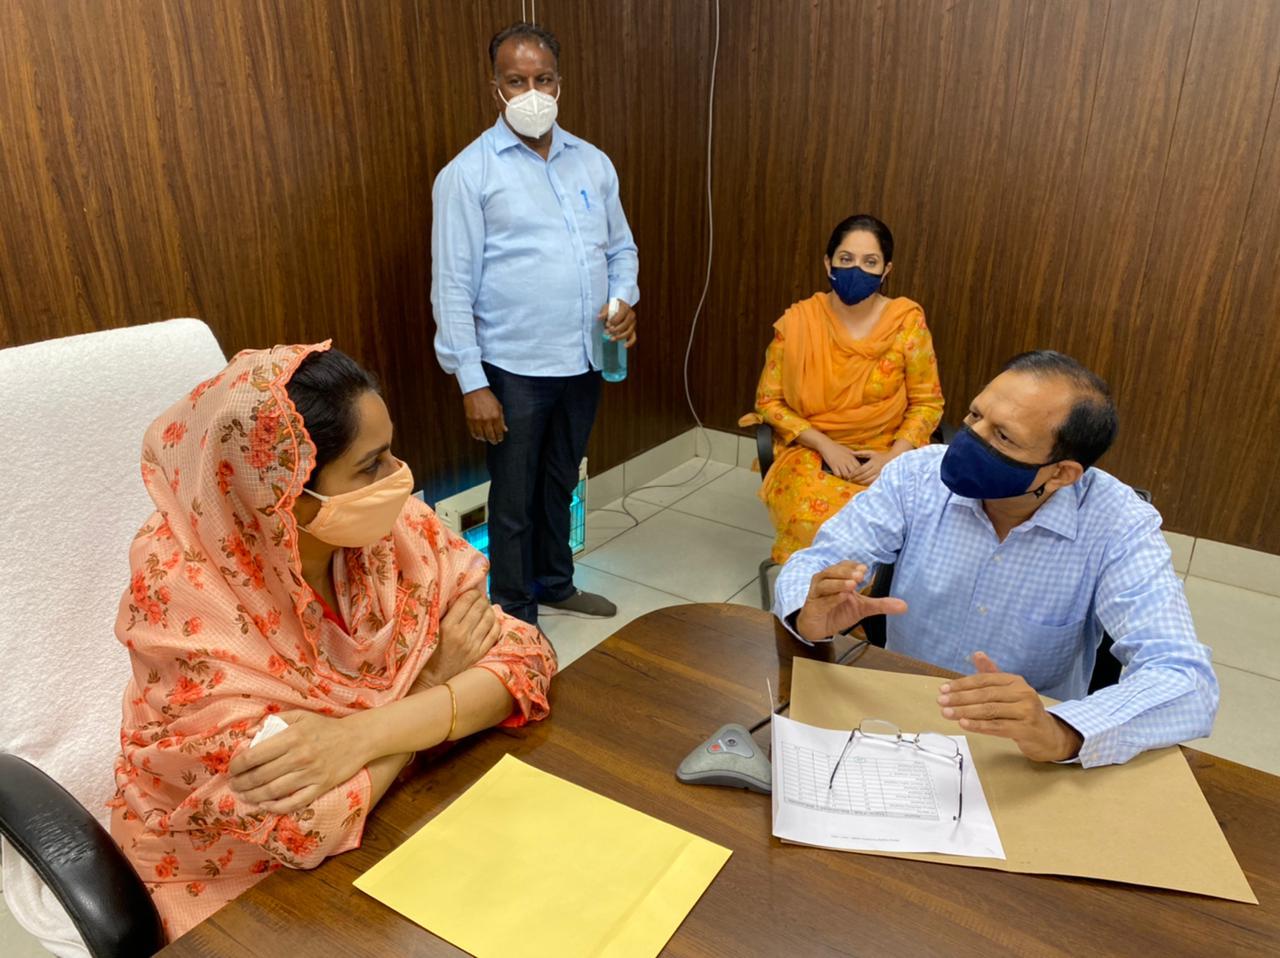 Amid fight against coronavirus, Harsimrat Kaur Badal has given Rs 1.43 cr to Mansa DC for establishing a PSA oxygen plant in a civil hospital.